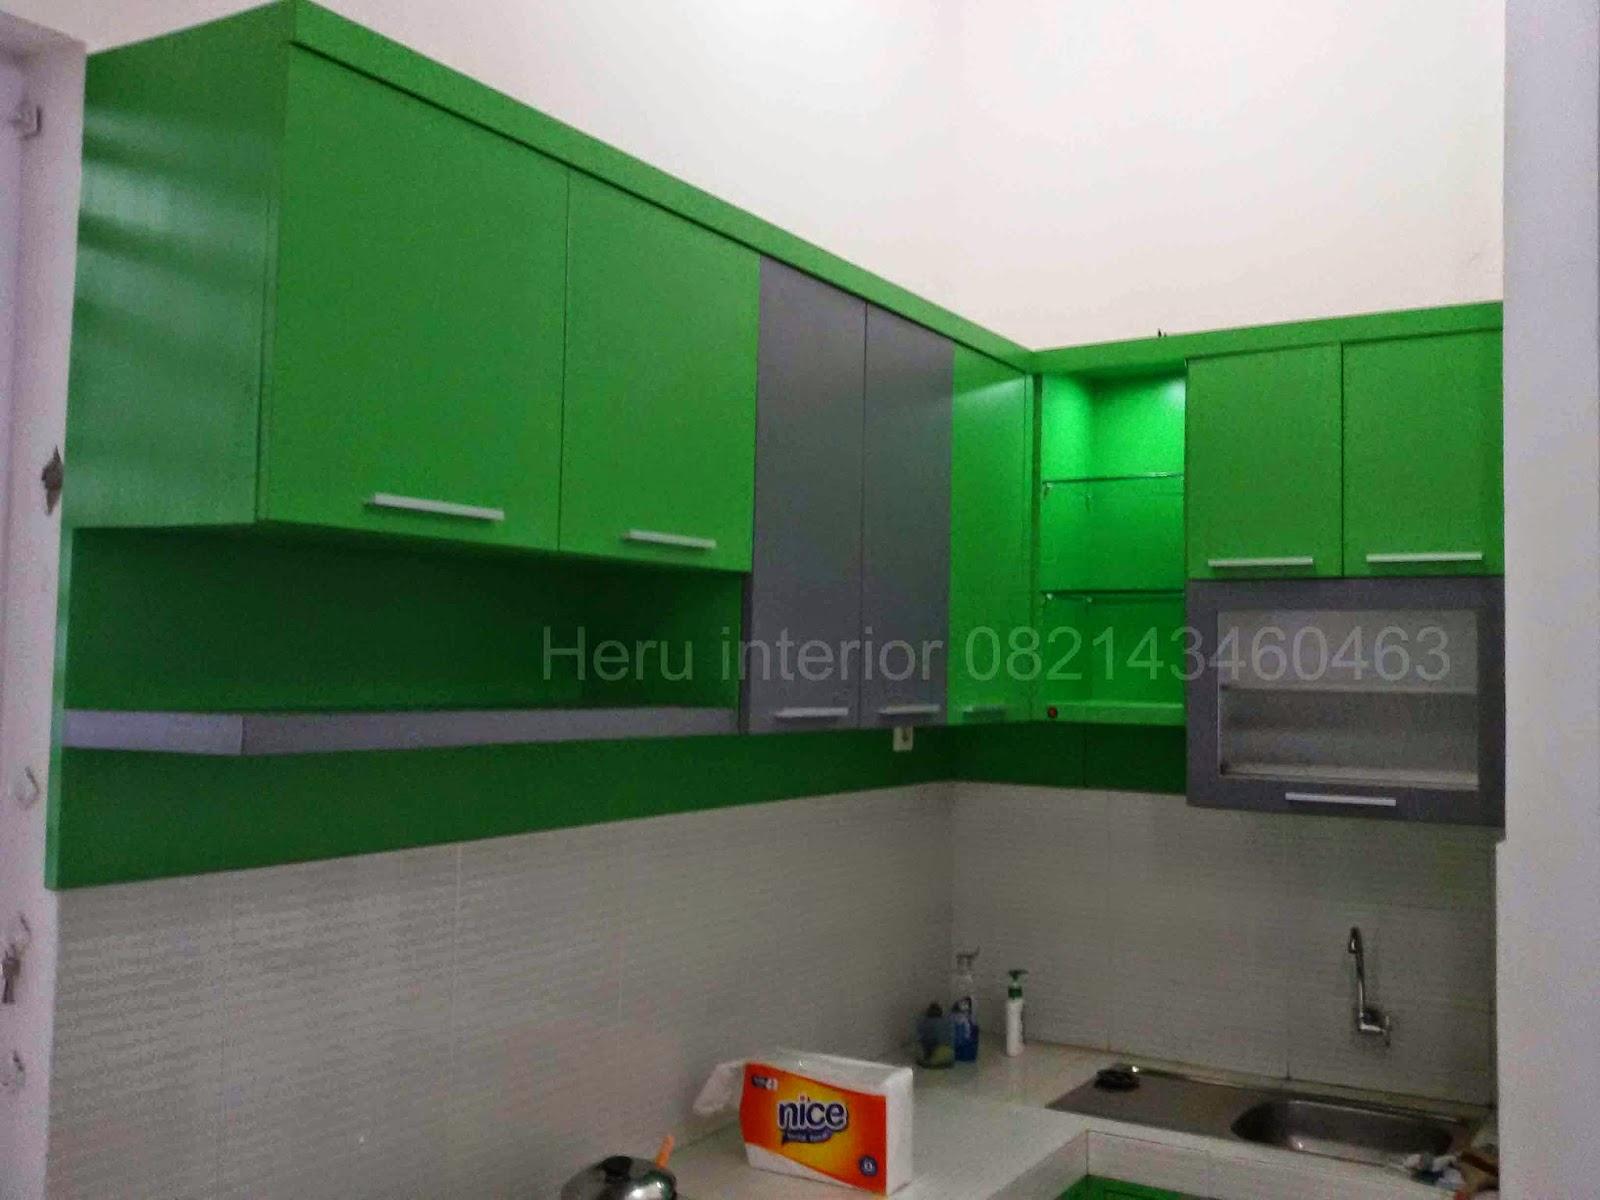 Kontraktor Interior Surabaya Sidoarjo Desain Kitchen Set Warna Hijau